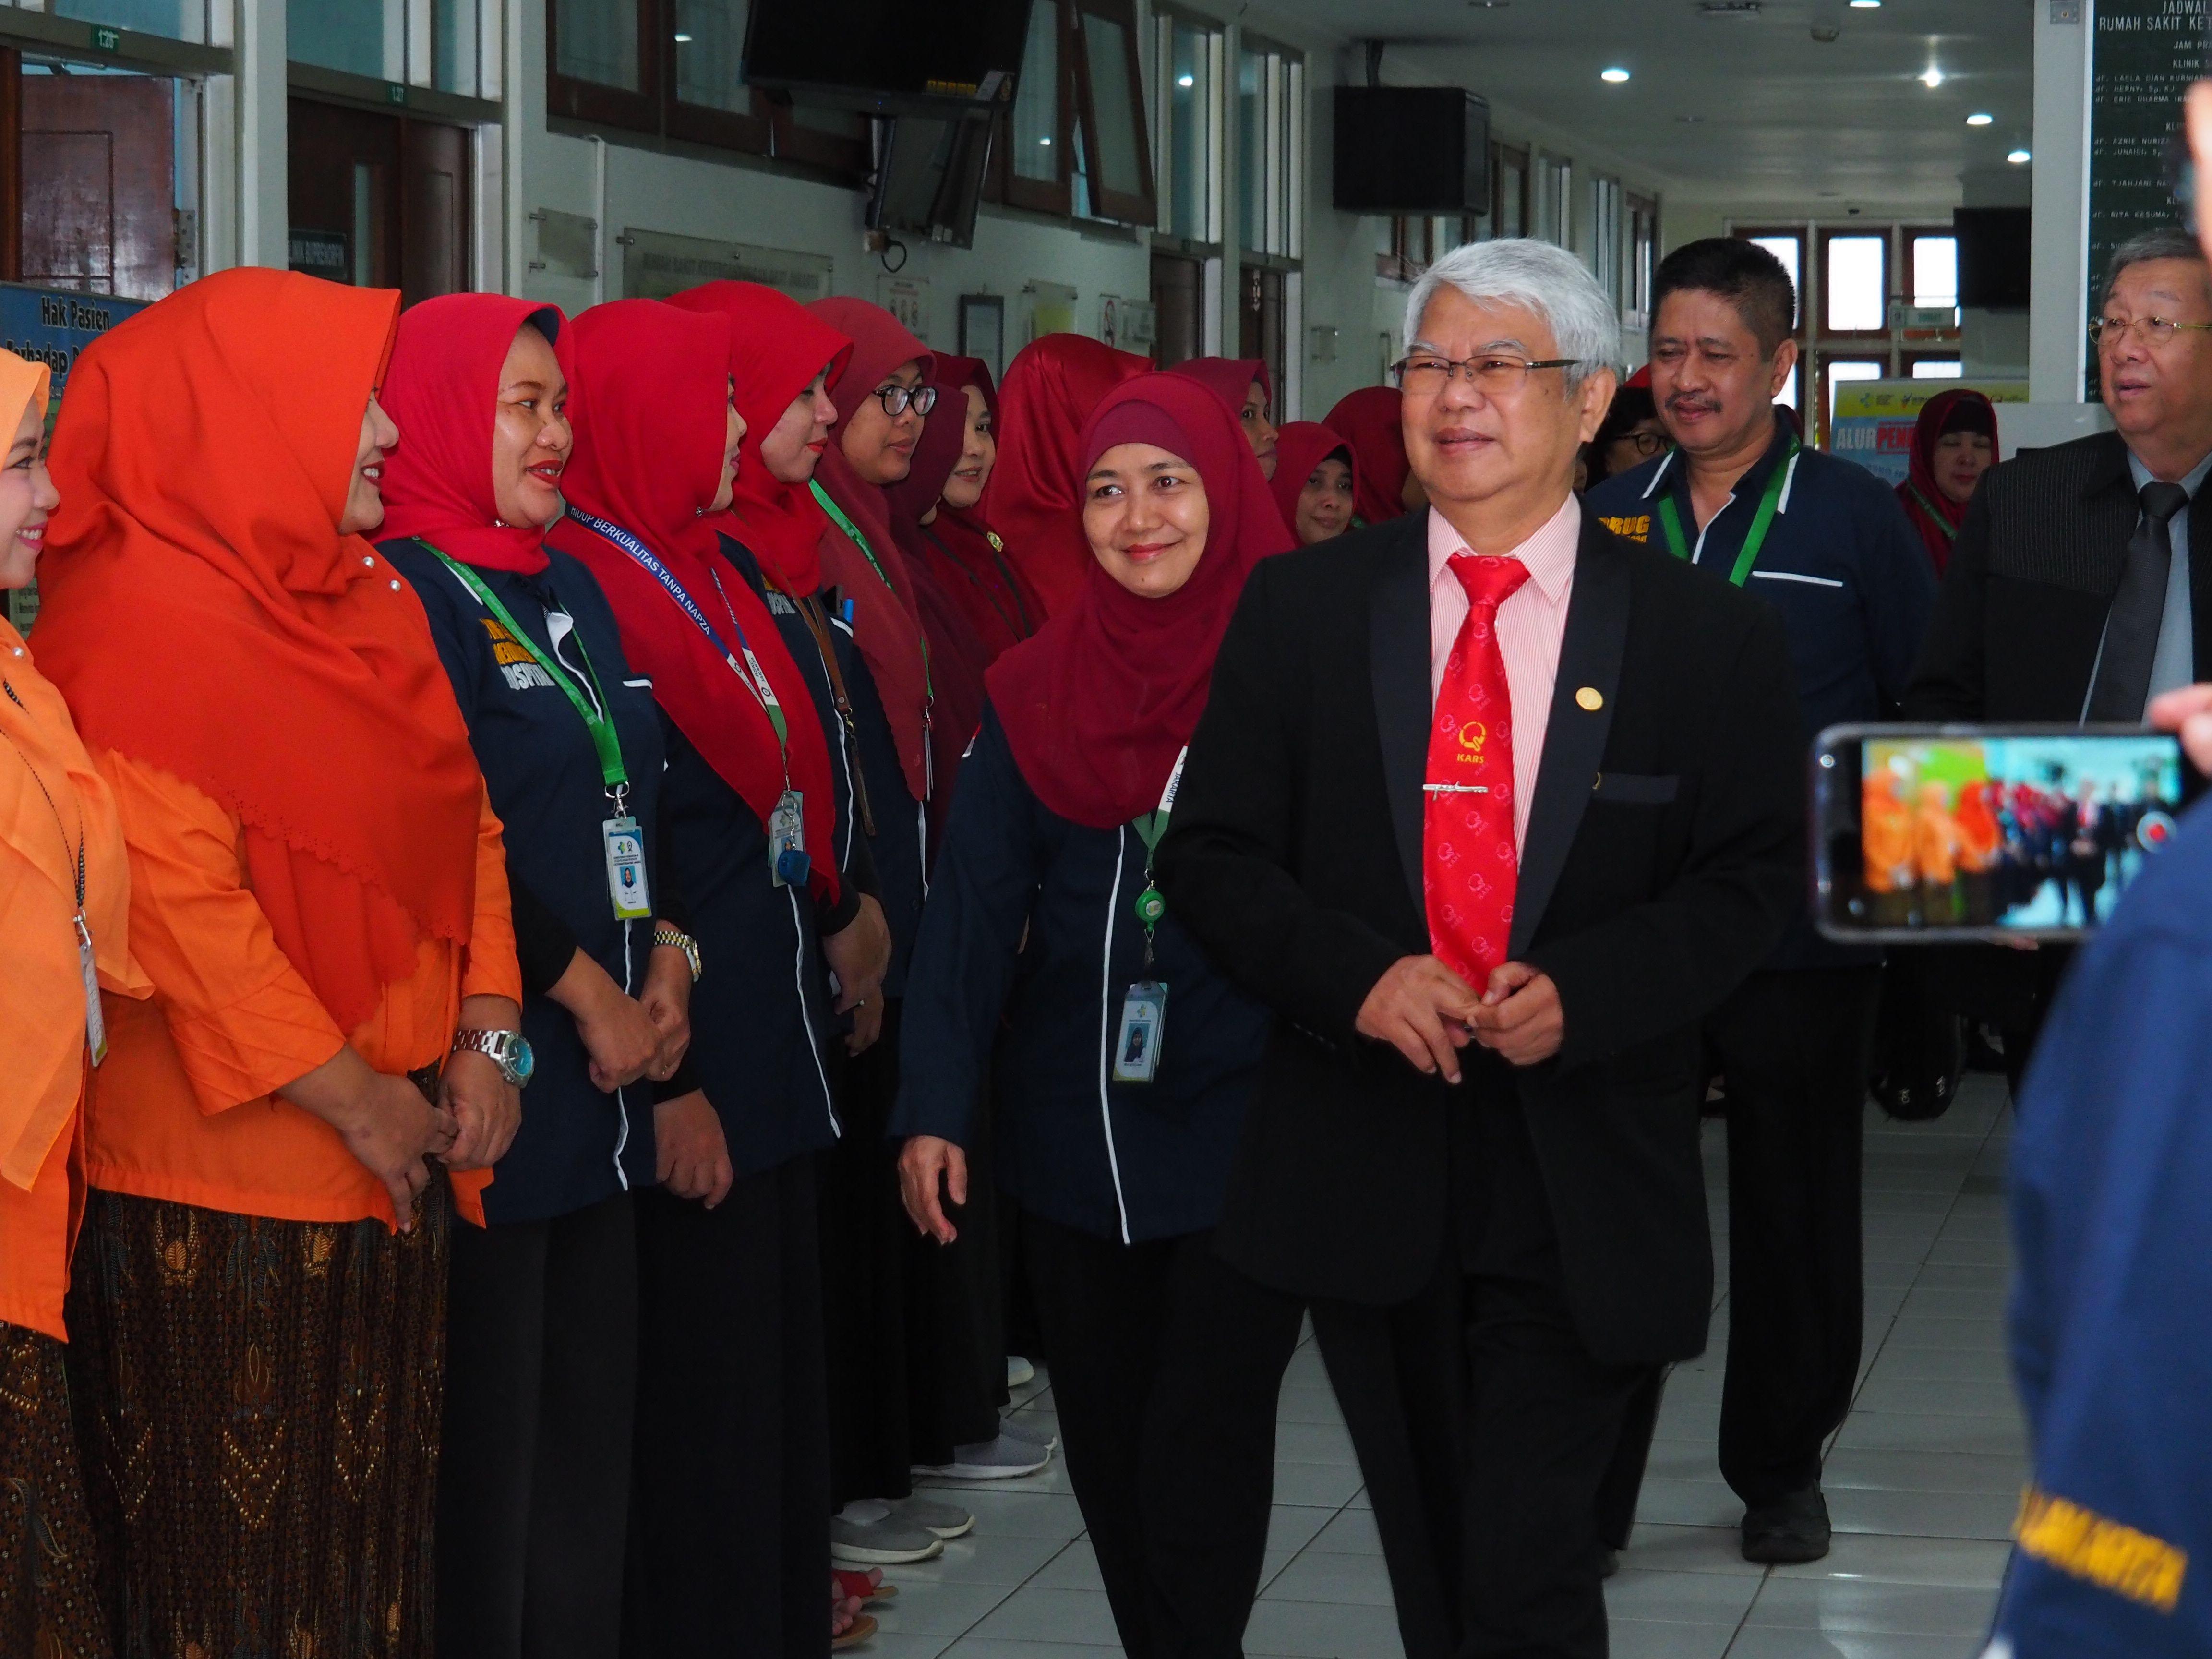 Deskripsi : Survior KARS disambut ASN RSKO Jakarta I Sumber Foto : dokpri